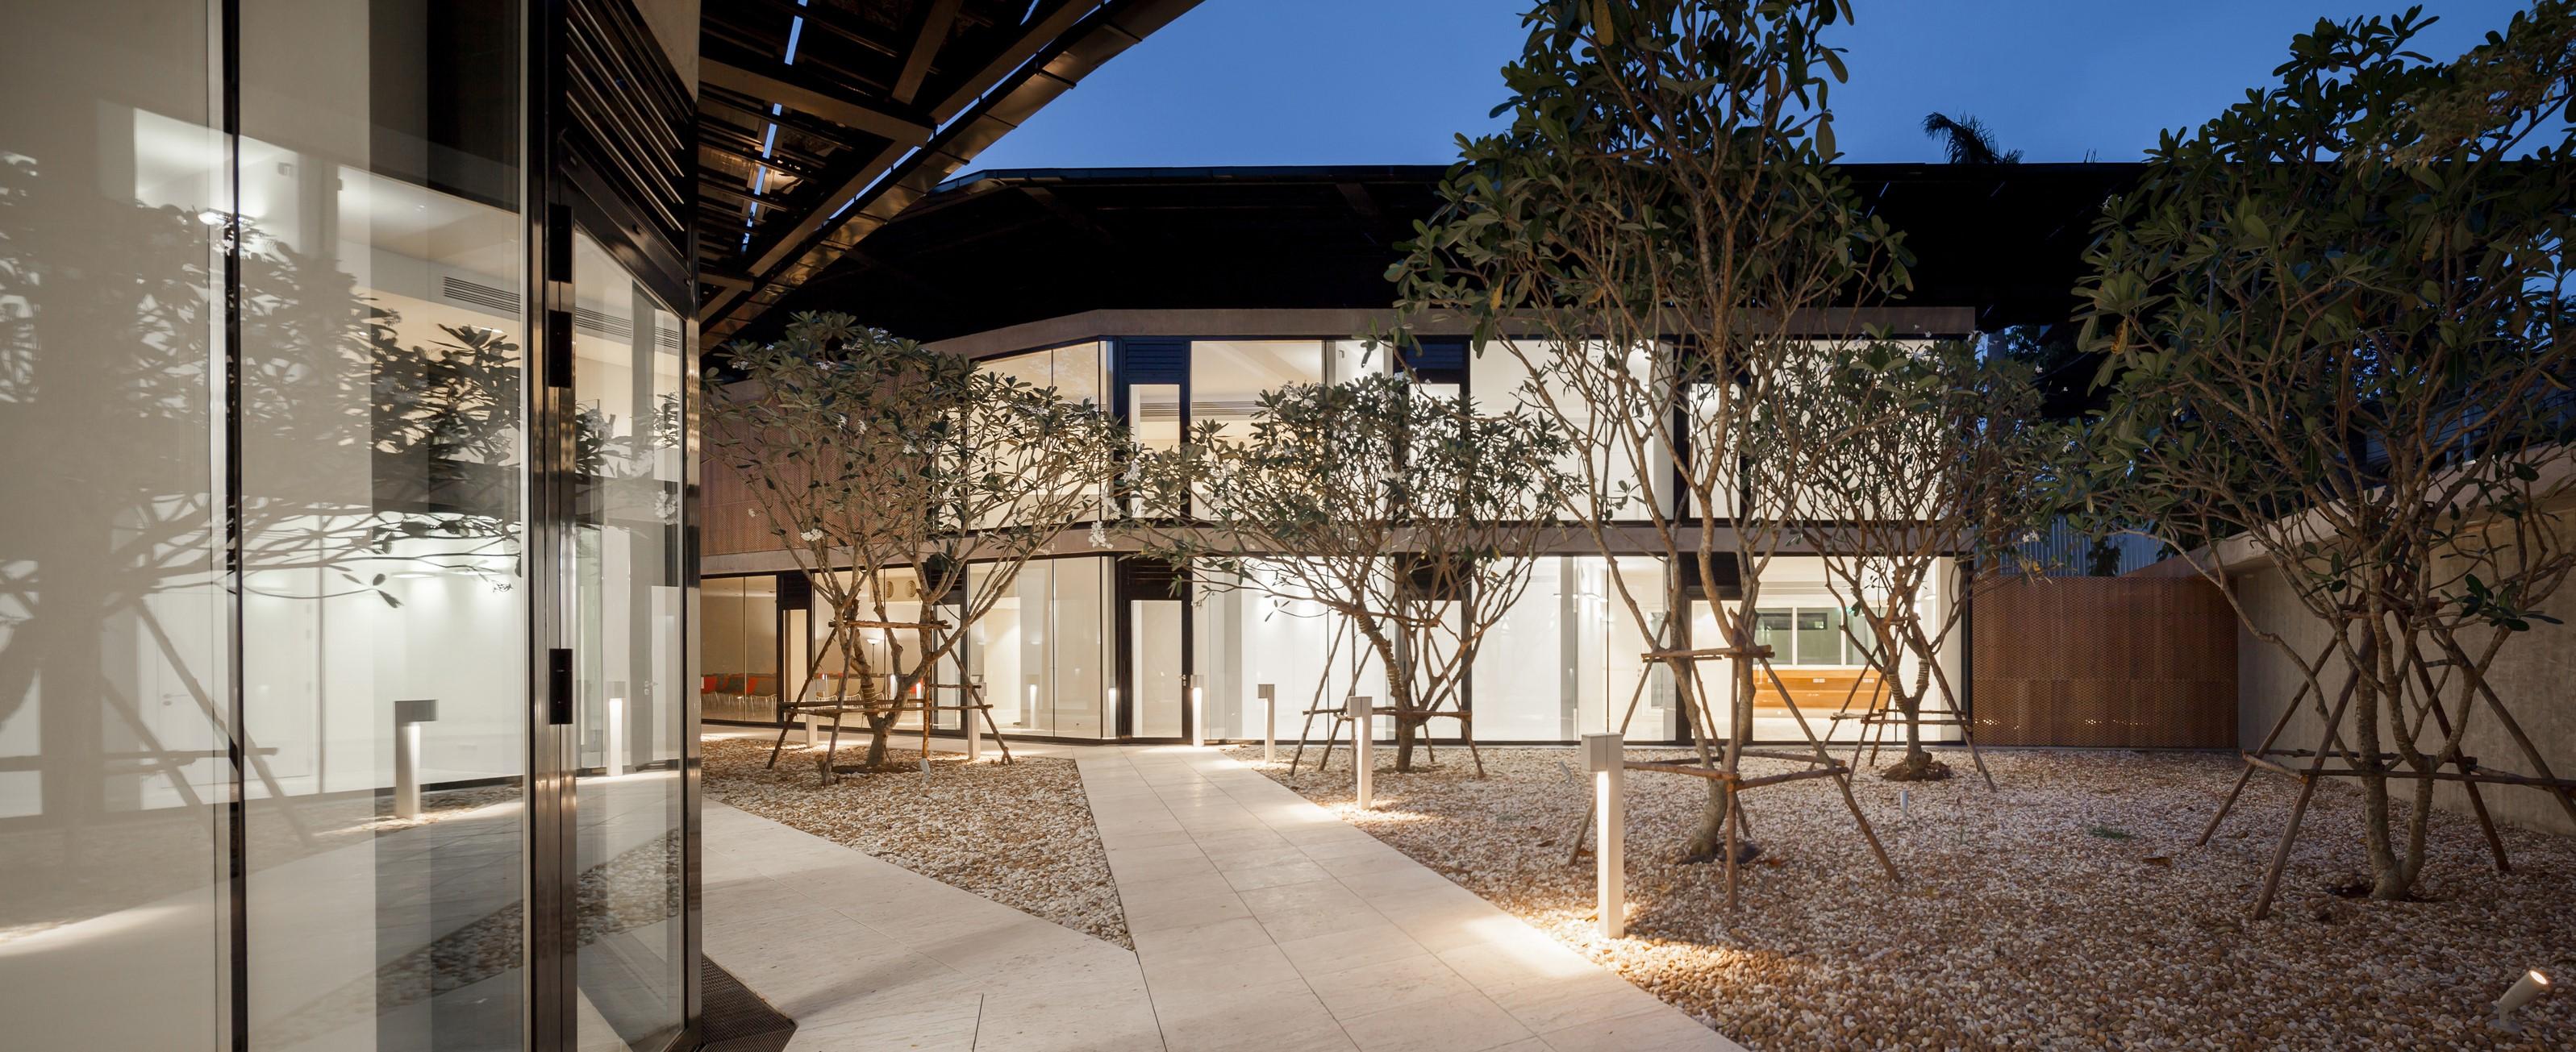 European Architecture Award geht an HOLODECK architects